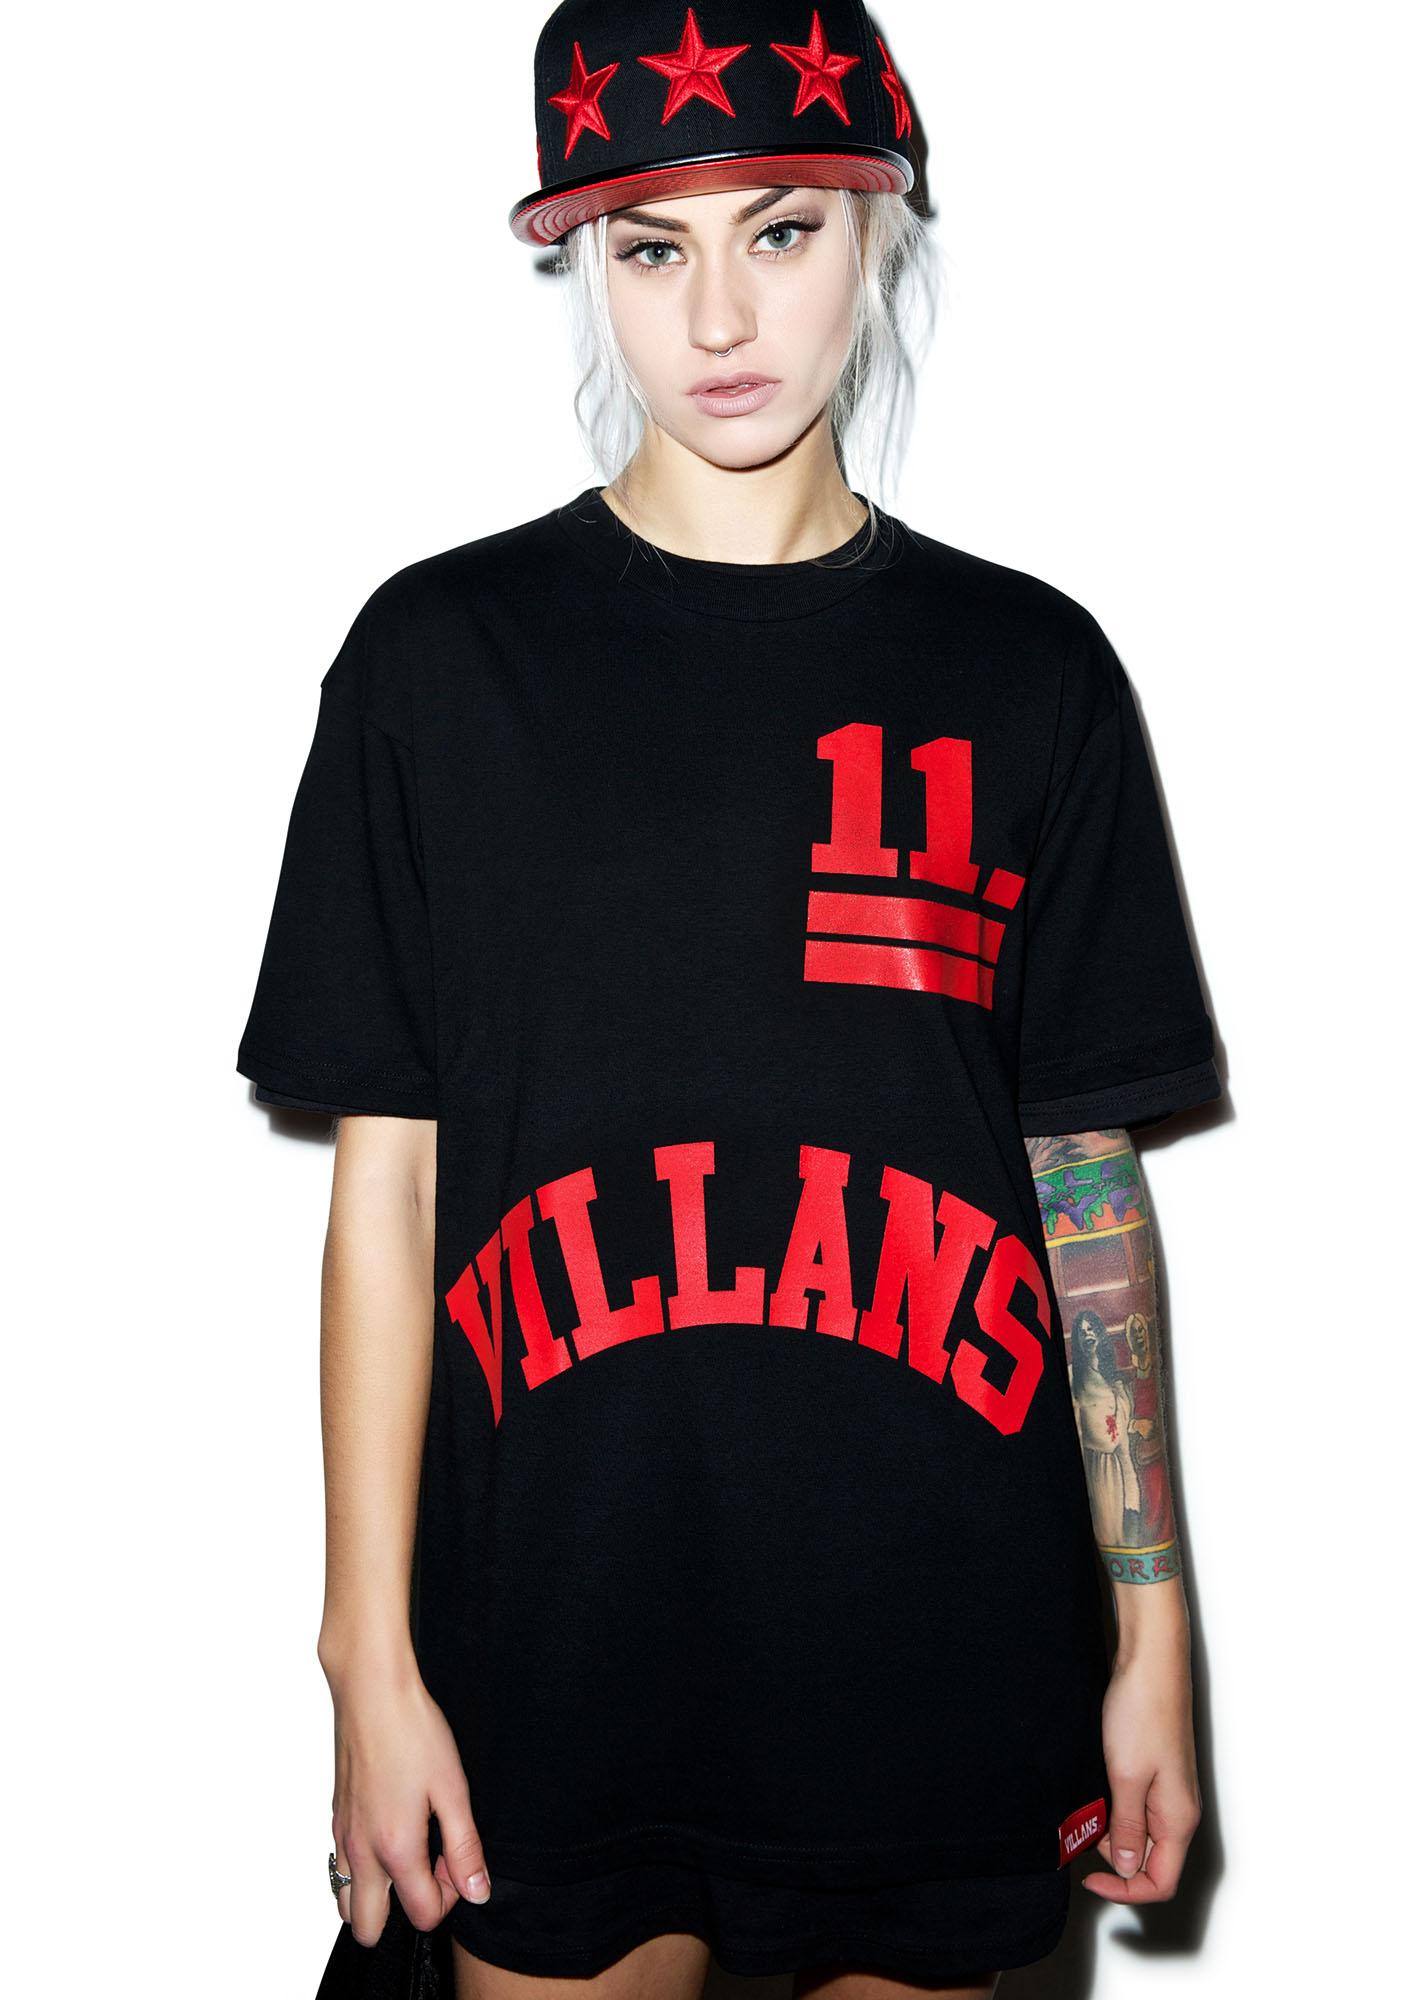 Villans Est. 11 Tee